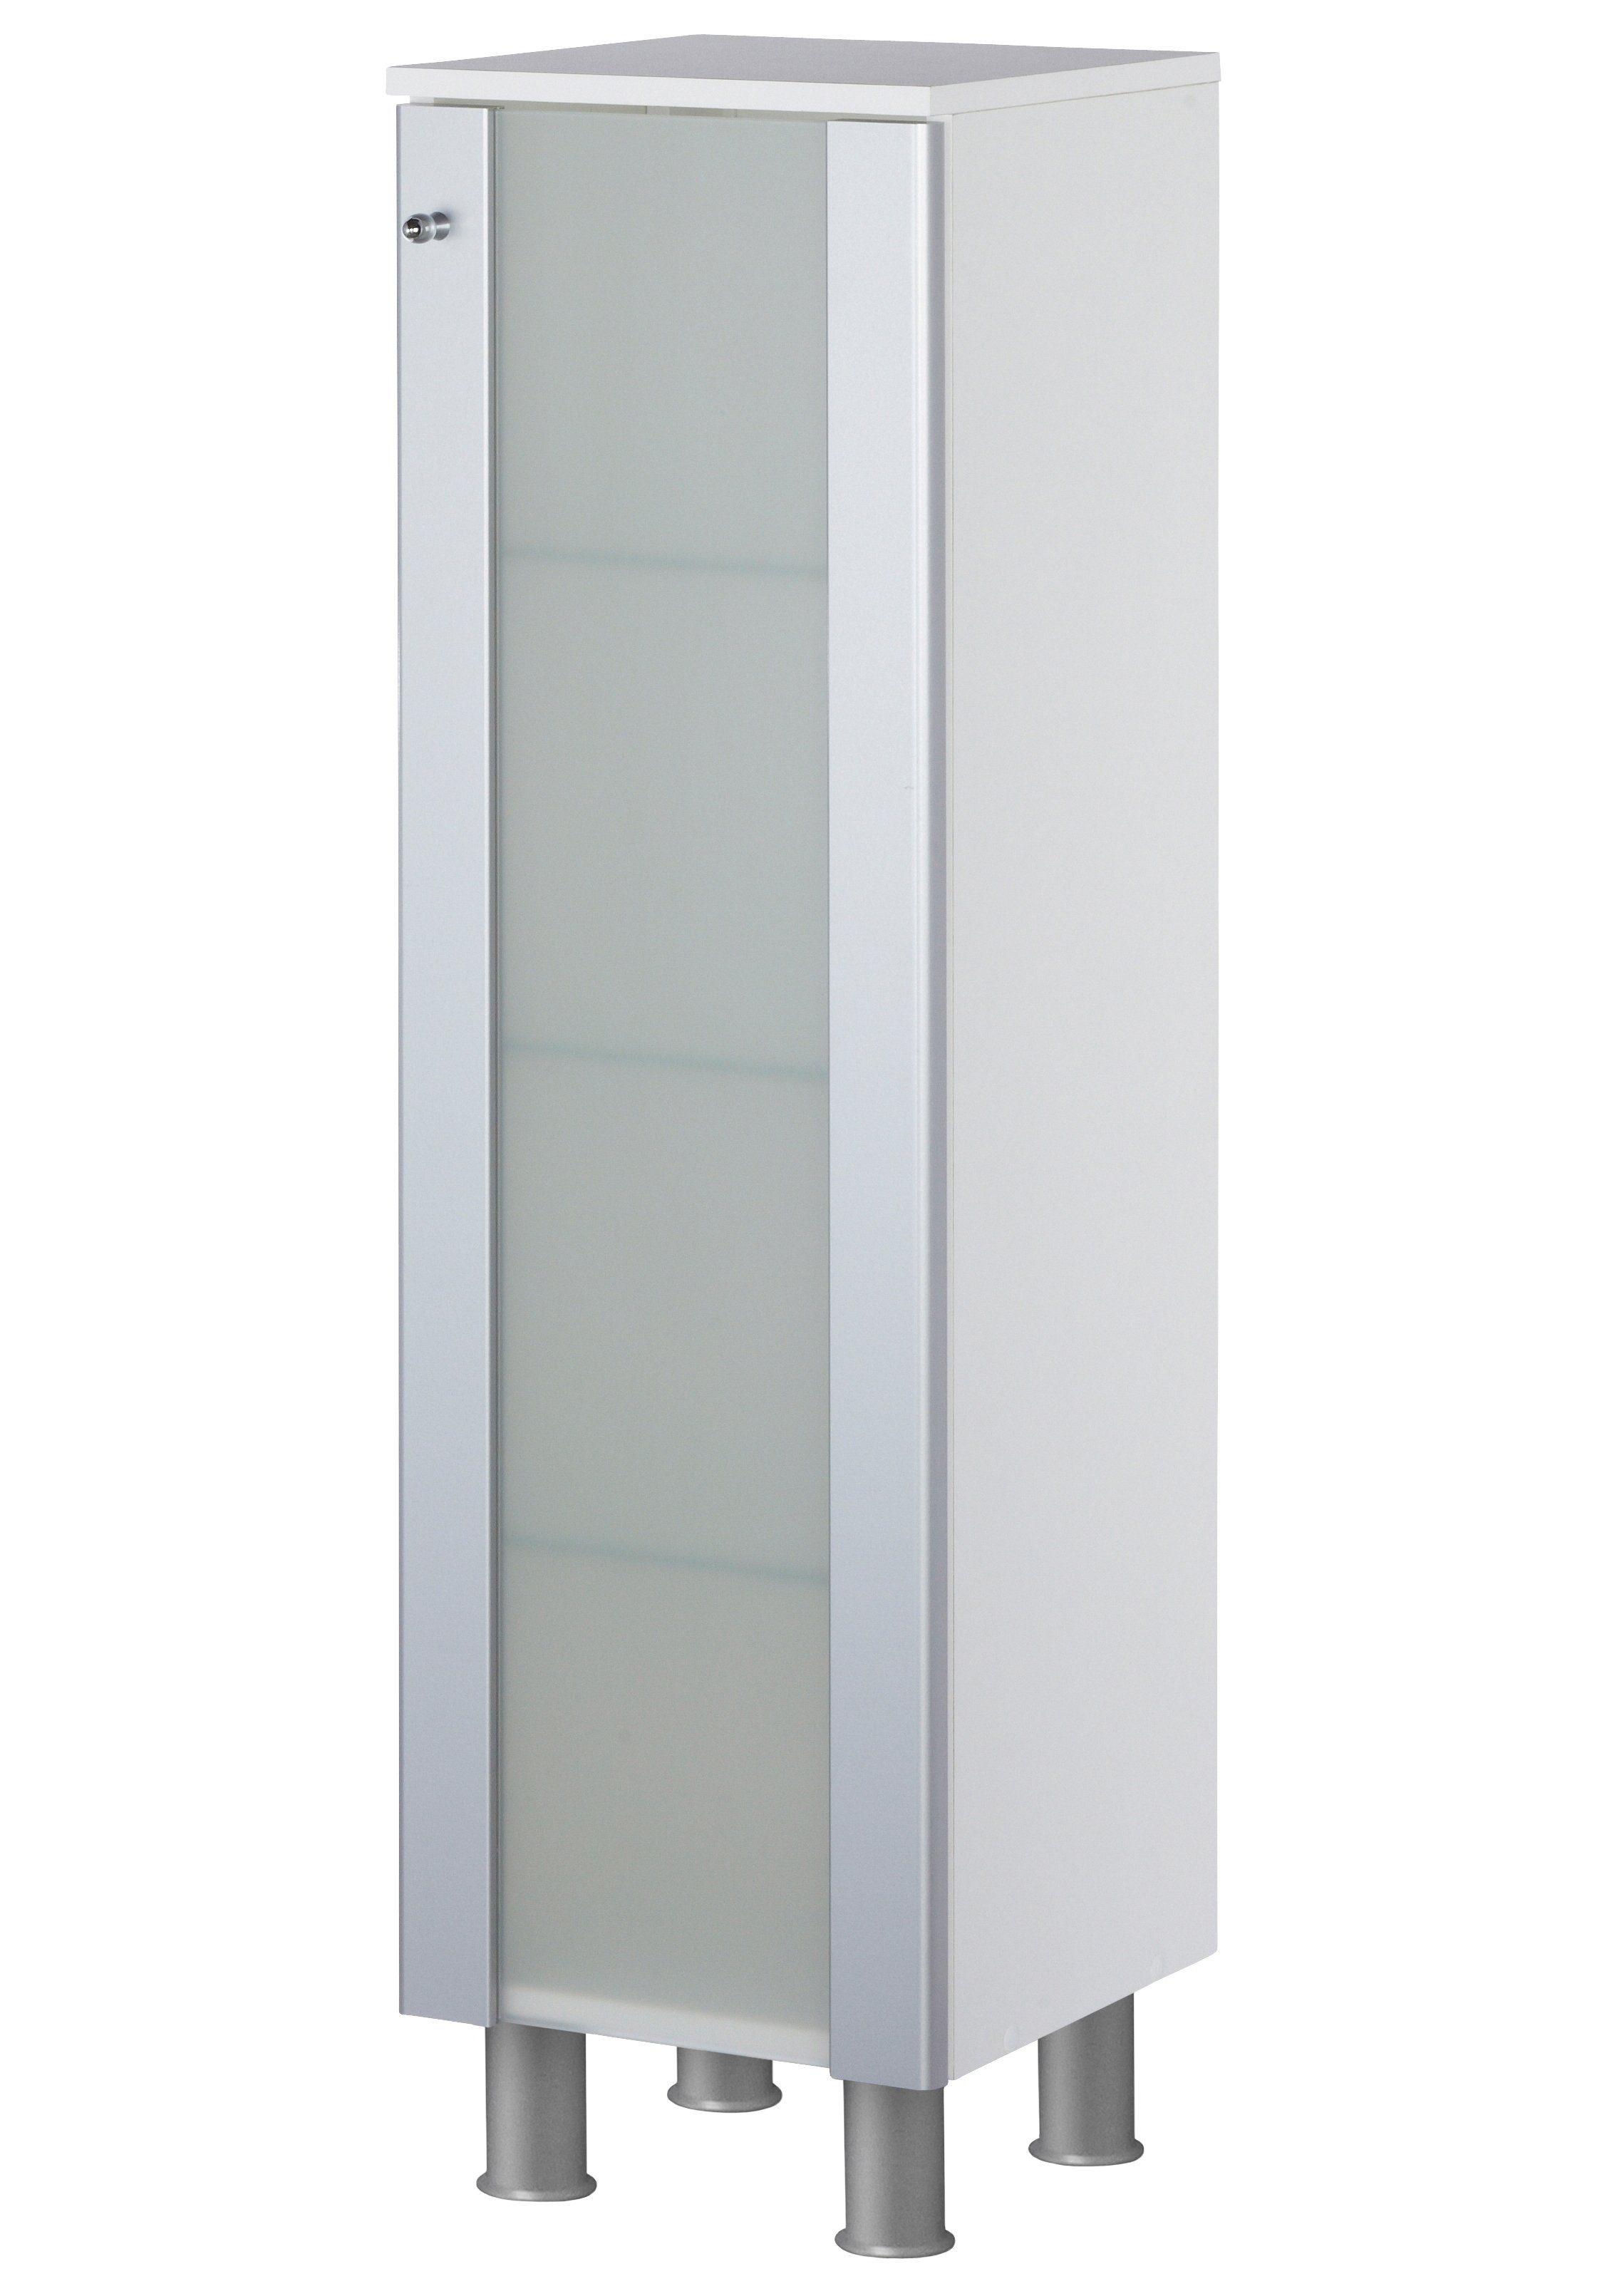 KESPER Midischrank »Ravenna«, Breite 32,5 cm